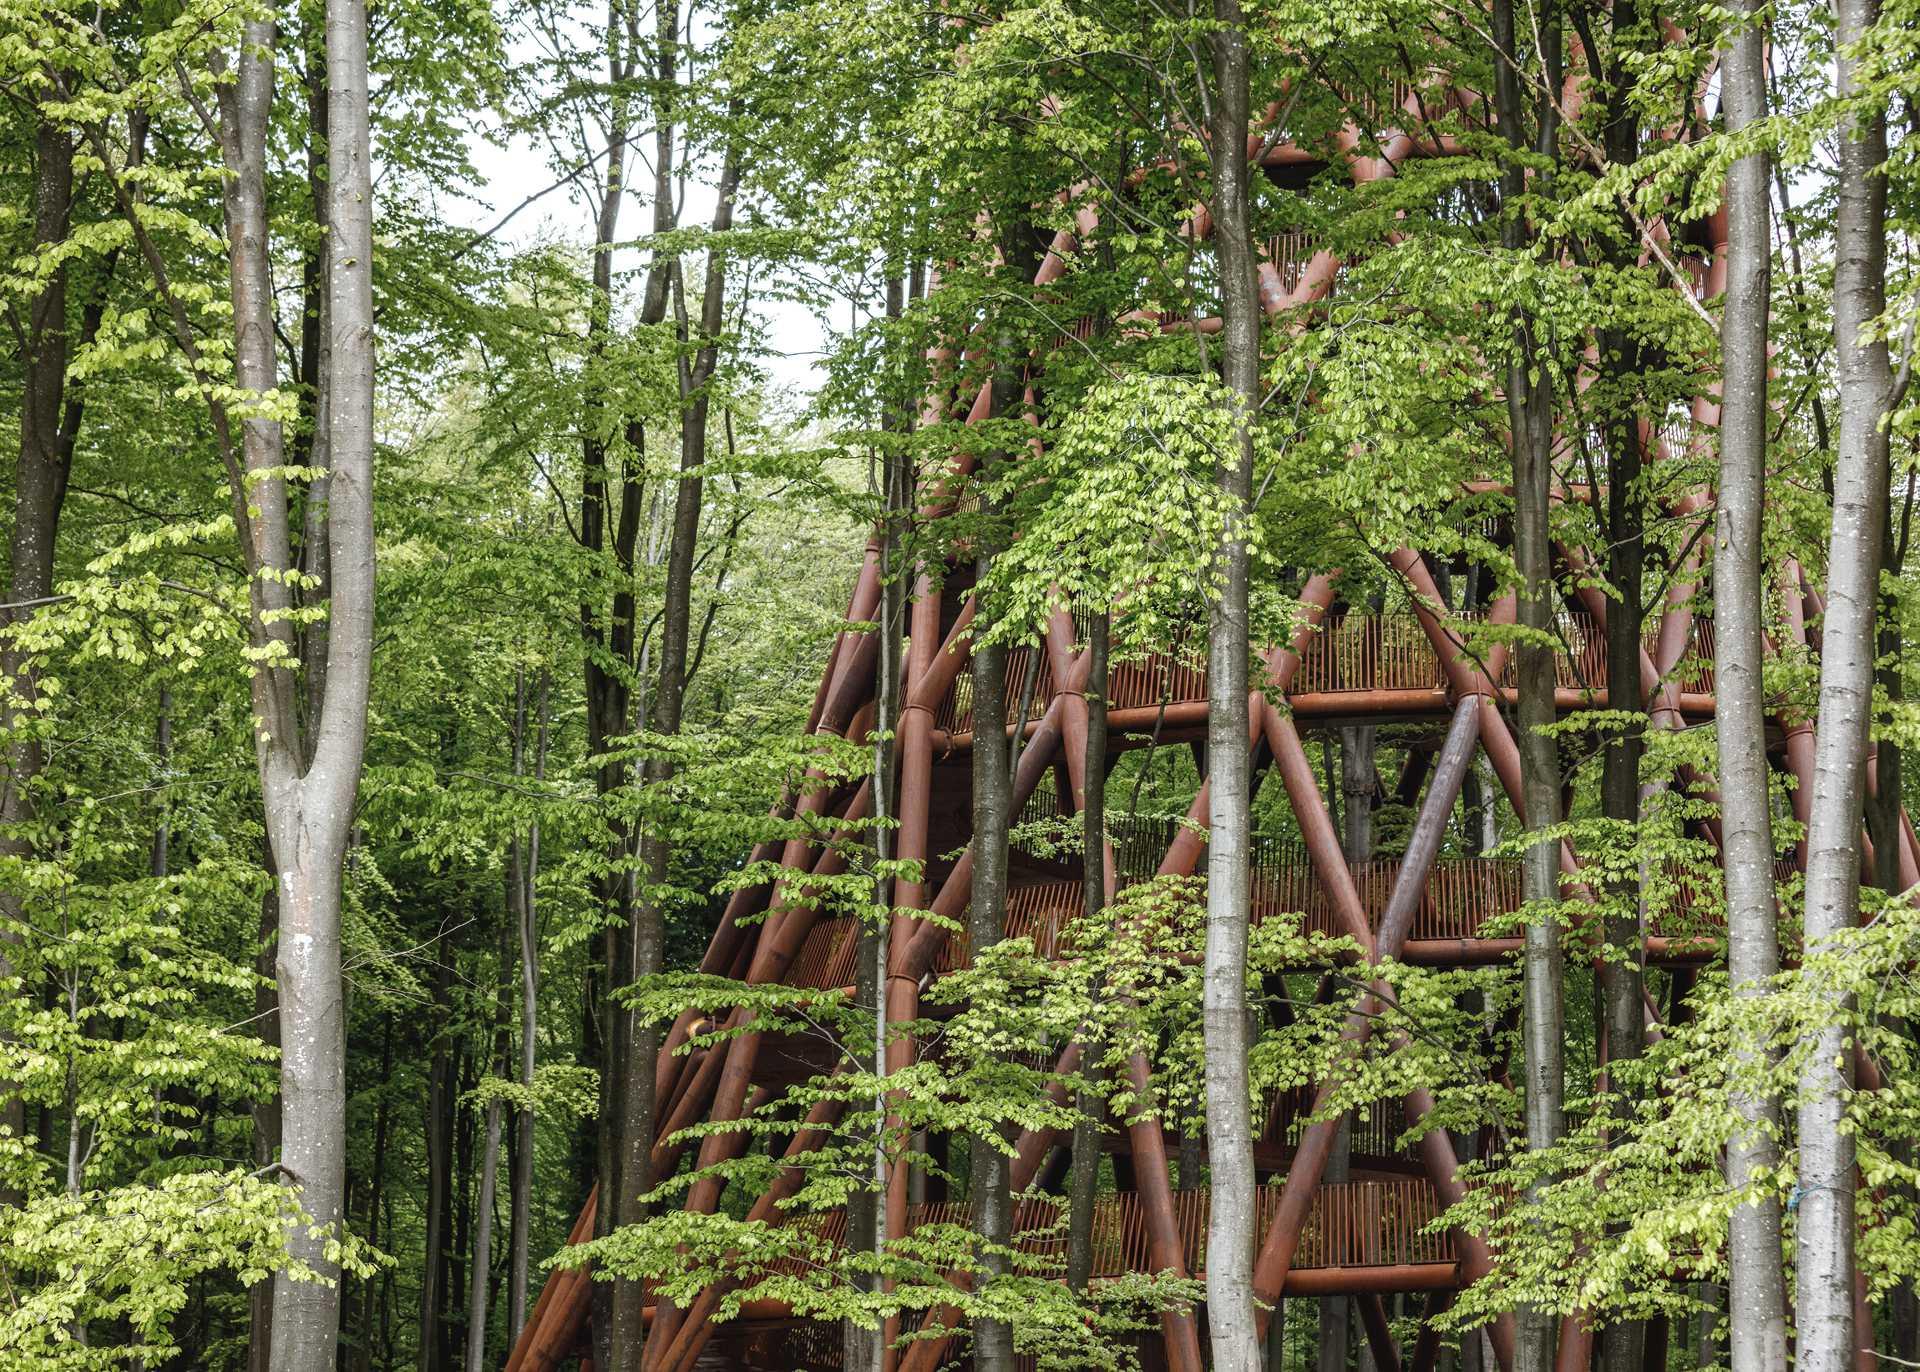 Camp Adventure Park  - 56 6 42